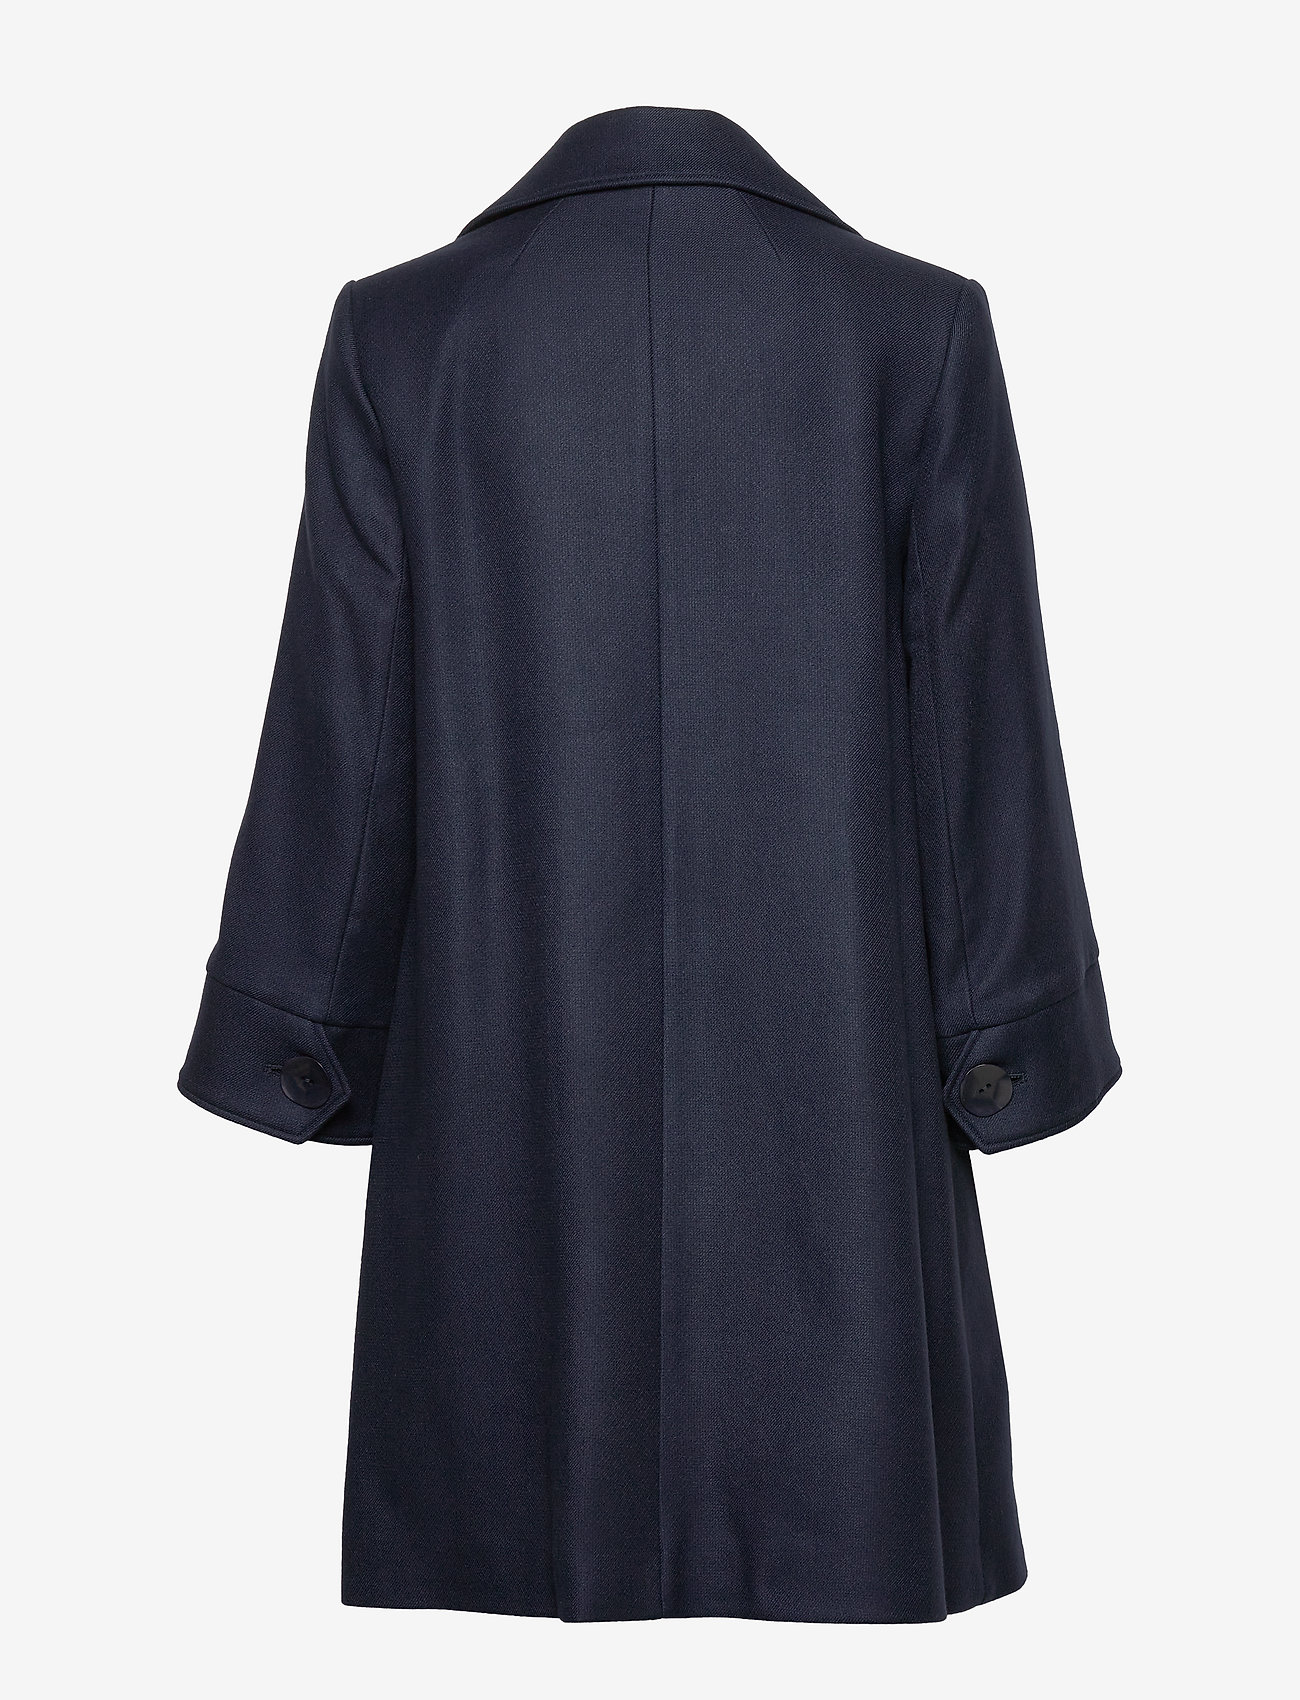 Morris Lady Robinne Coat - Jackets & Coats